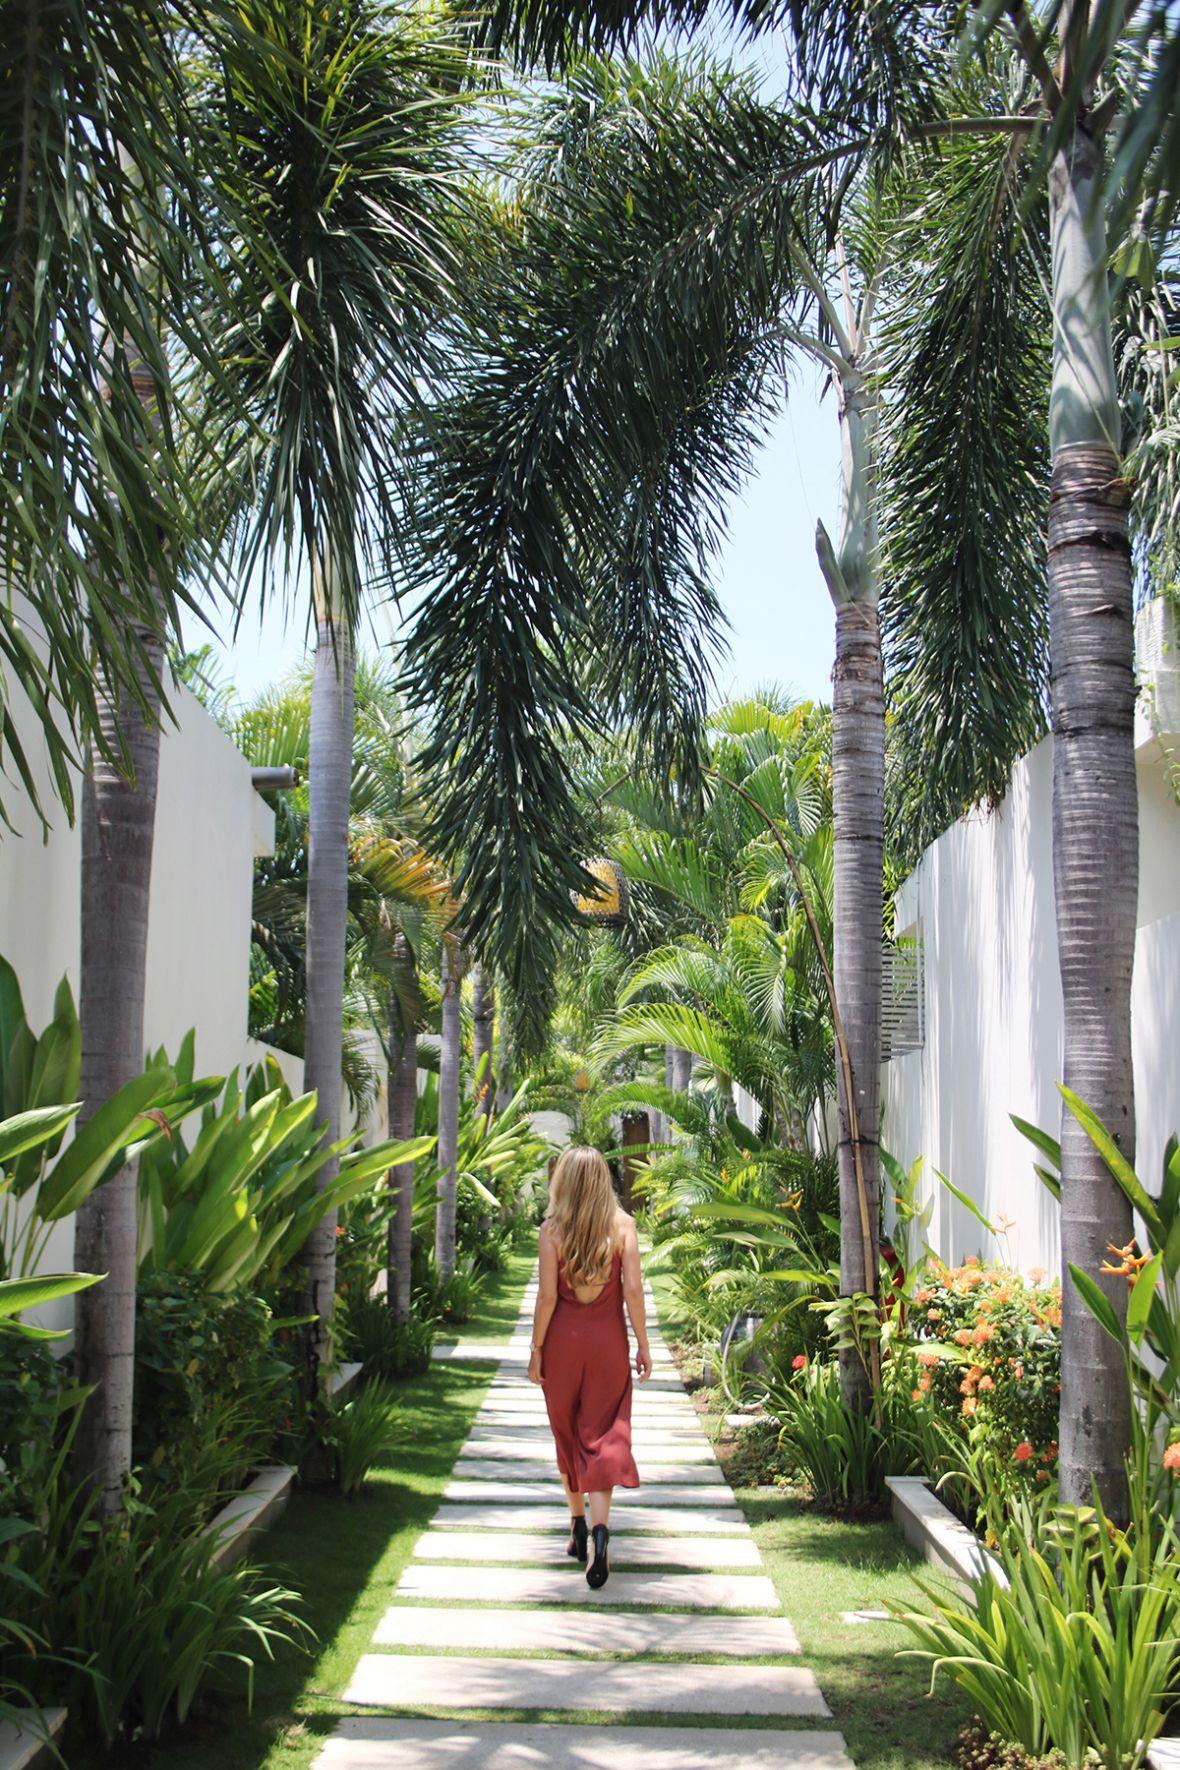 Chandra Bali Villas My Favorite Place In Bali More On The Blog Www Andathousandwords Com Tropical Garden Design Tropical Landscaping Garden Landscape Design